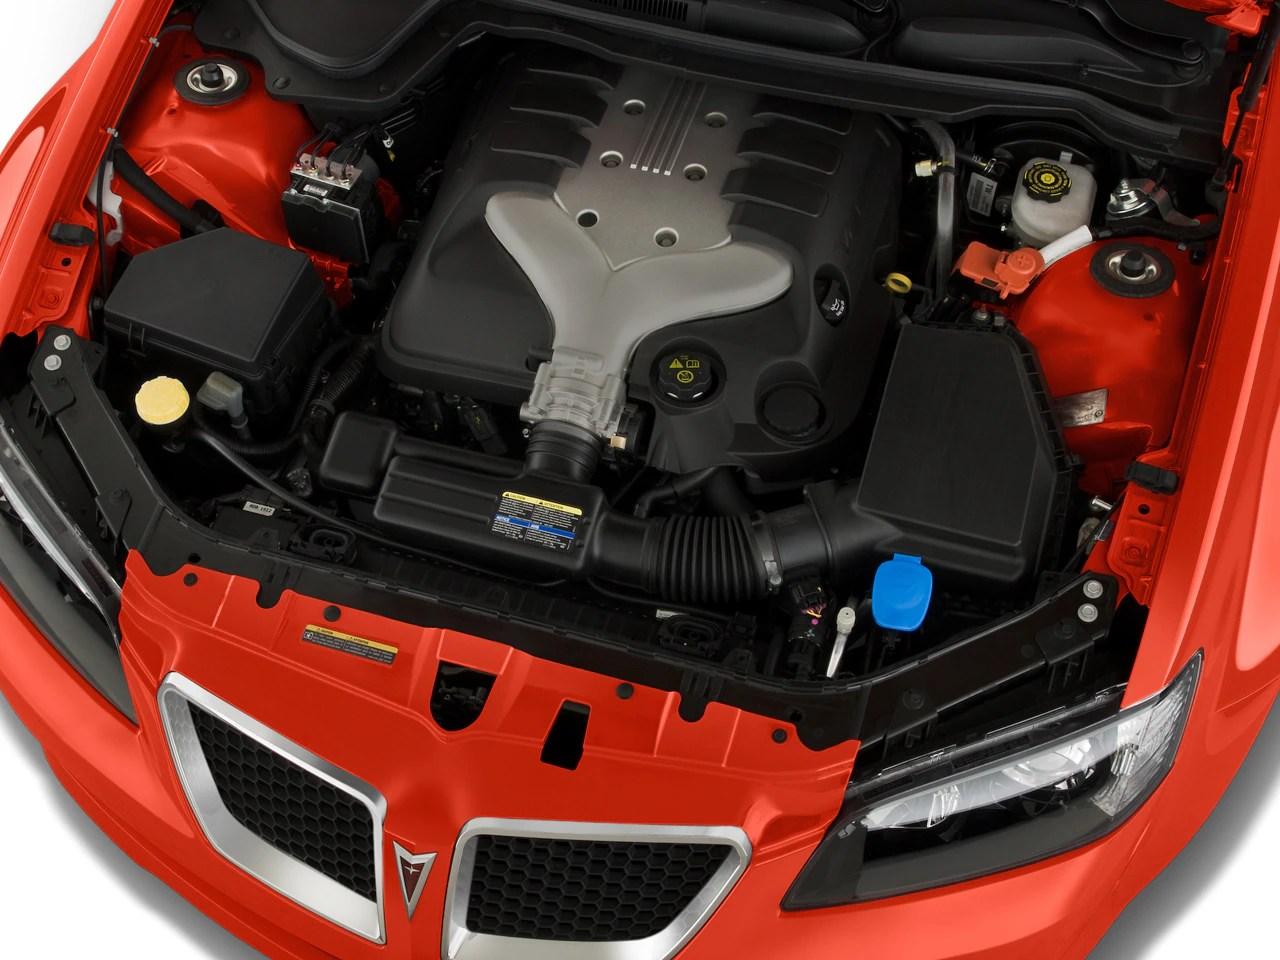 hight resolution of pontiac g8 reviews research new used models motortrend rh motortrend com pontiac g8 v6 engine diagram